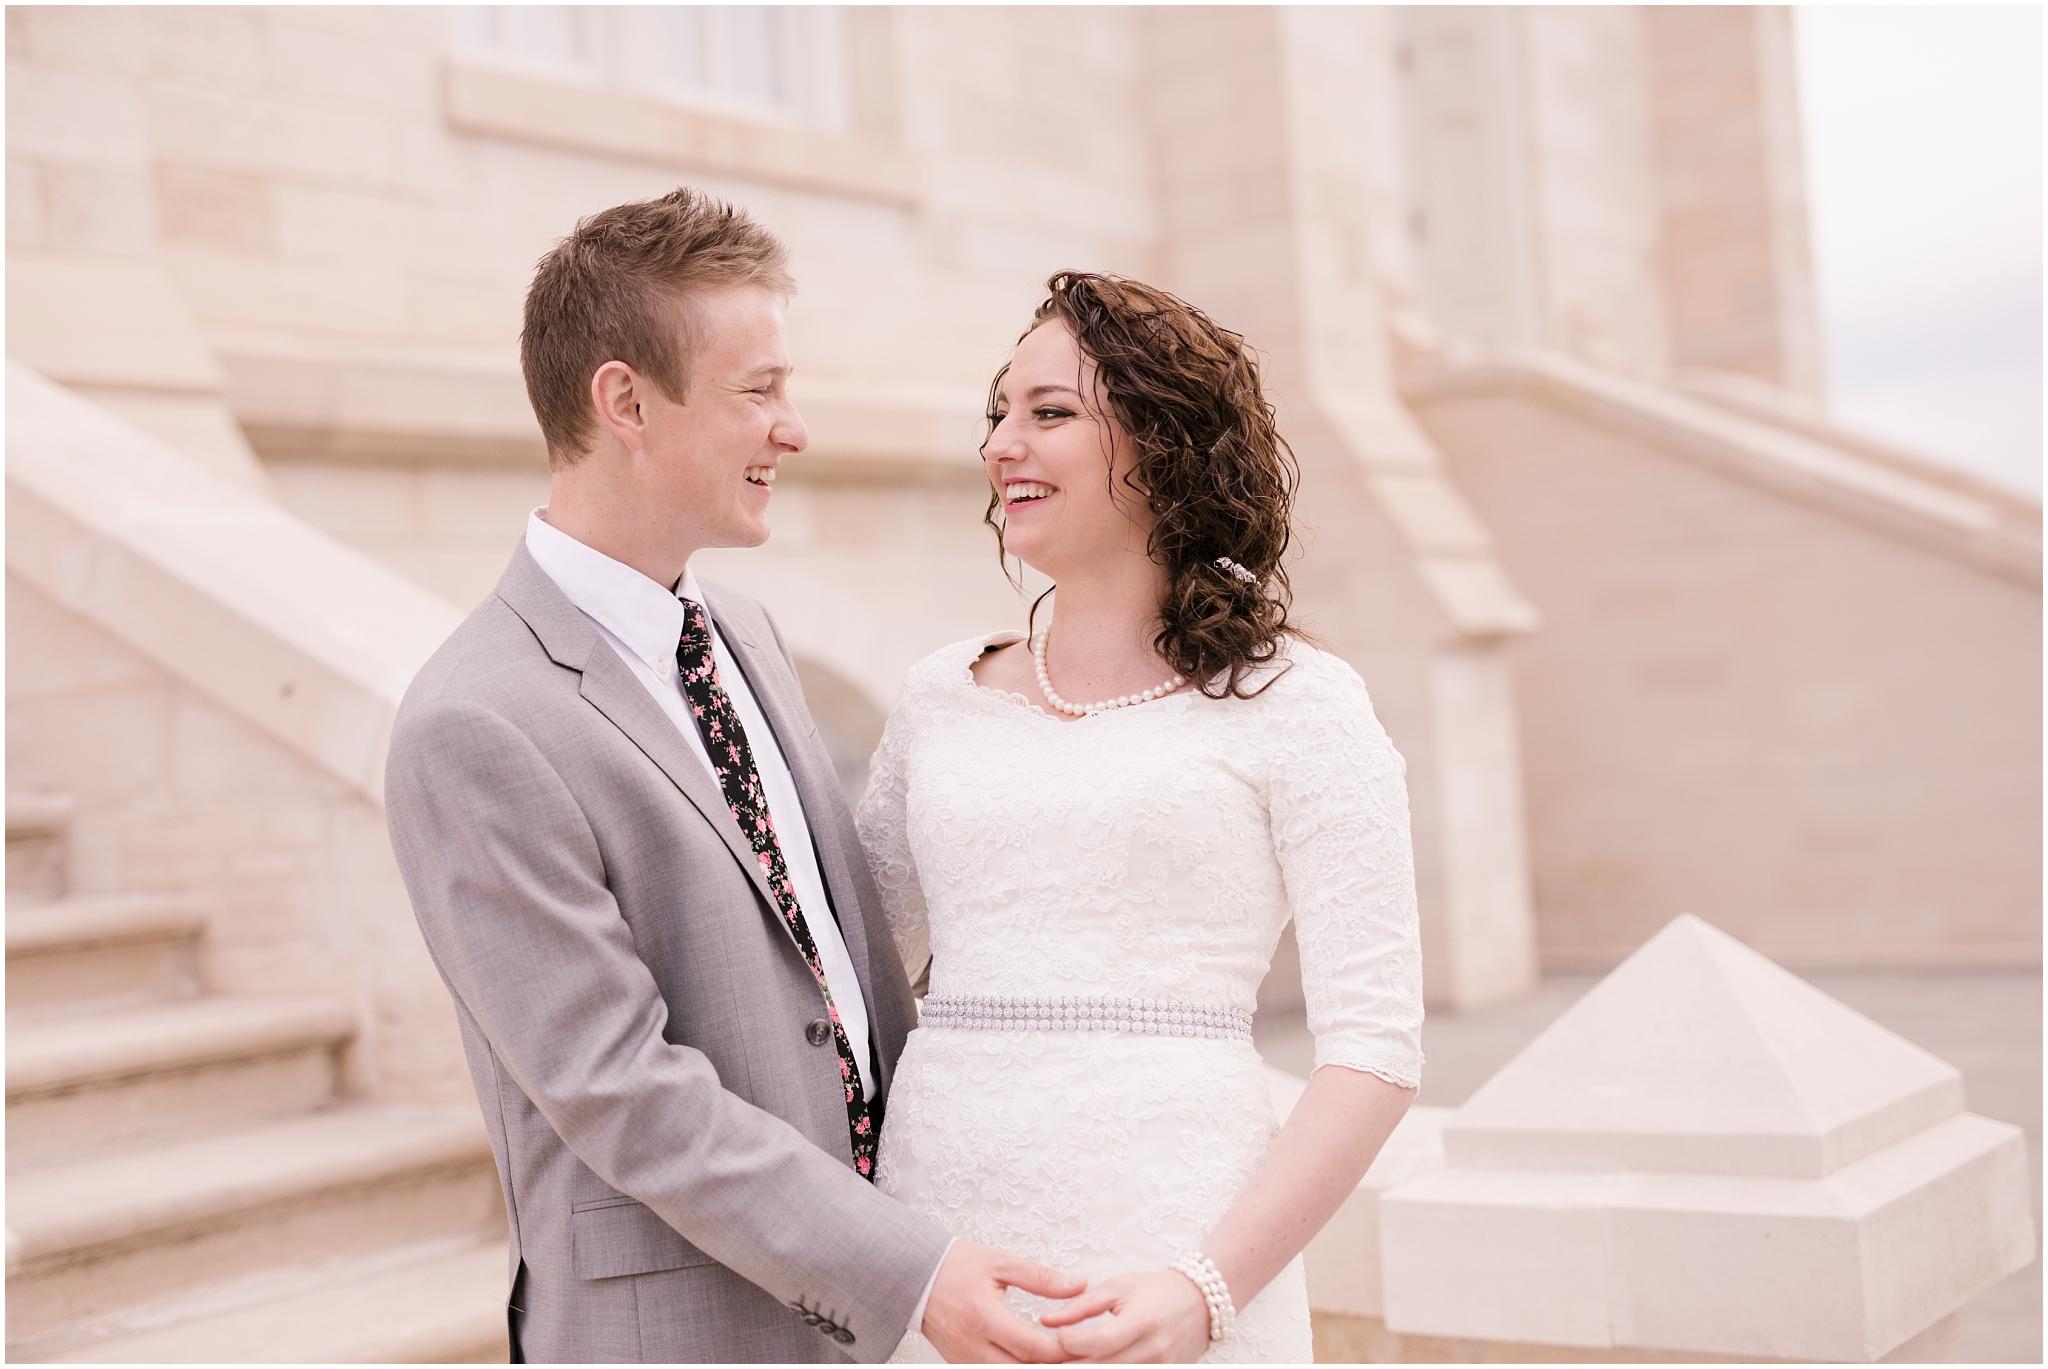 BA-Bridals-127_Lizzie-B-Imagery-Utah-Wedding-Photographer-Central-Utah-Photographer-Utah-County-Manti-Utah-Temple.jpg